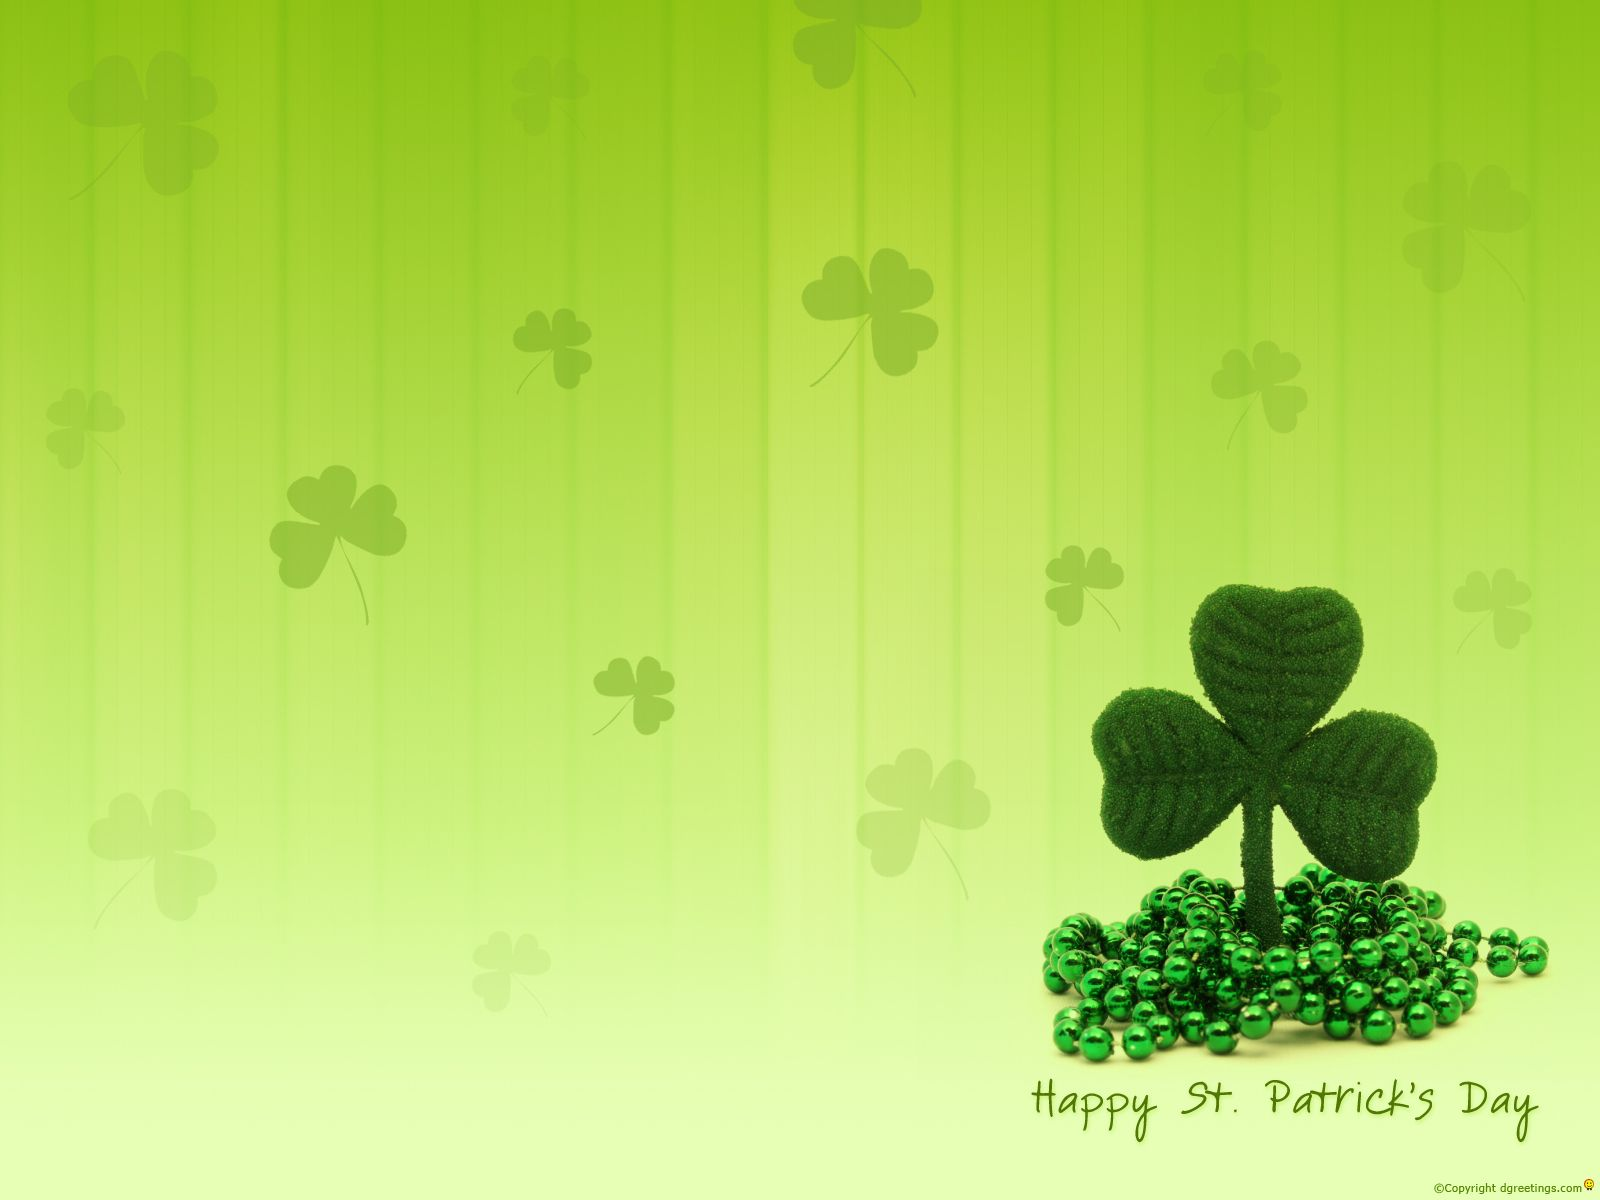 St Patricks Day Desktop Wallpapers   Happy St Patricks Day 1600x1200